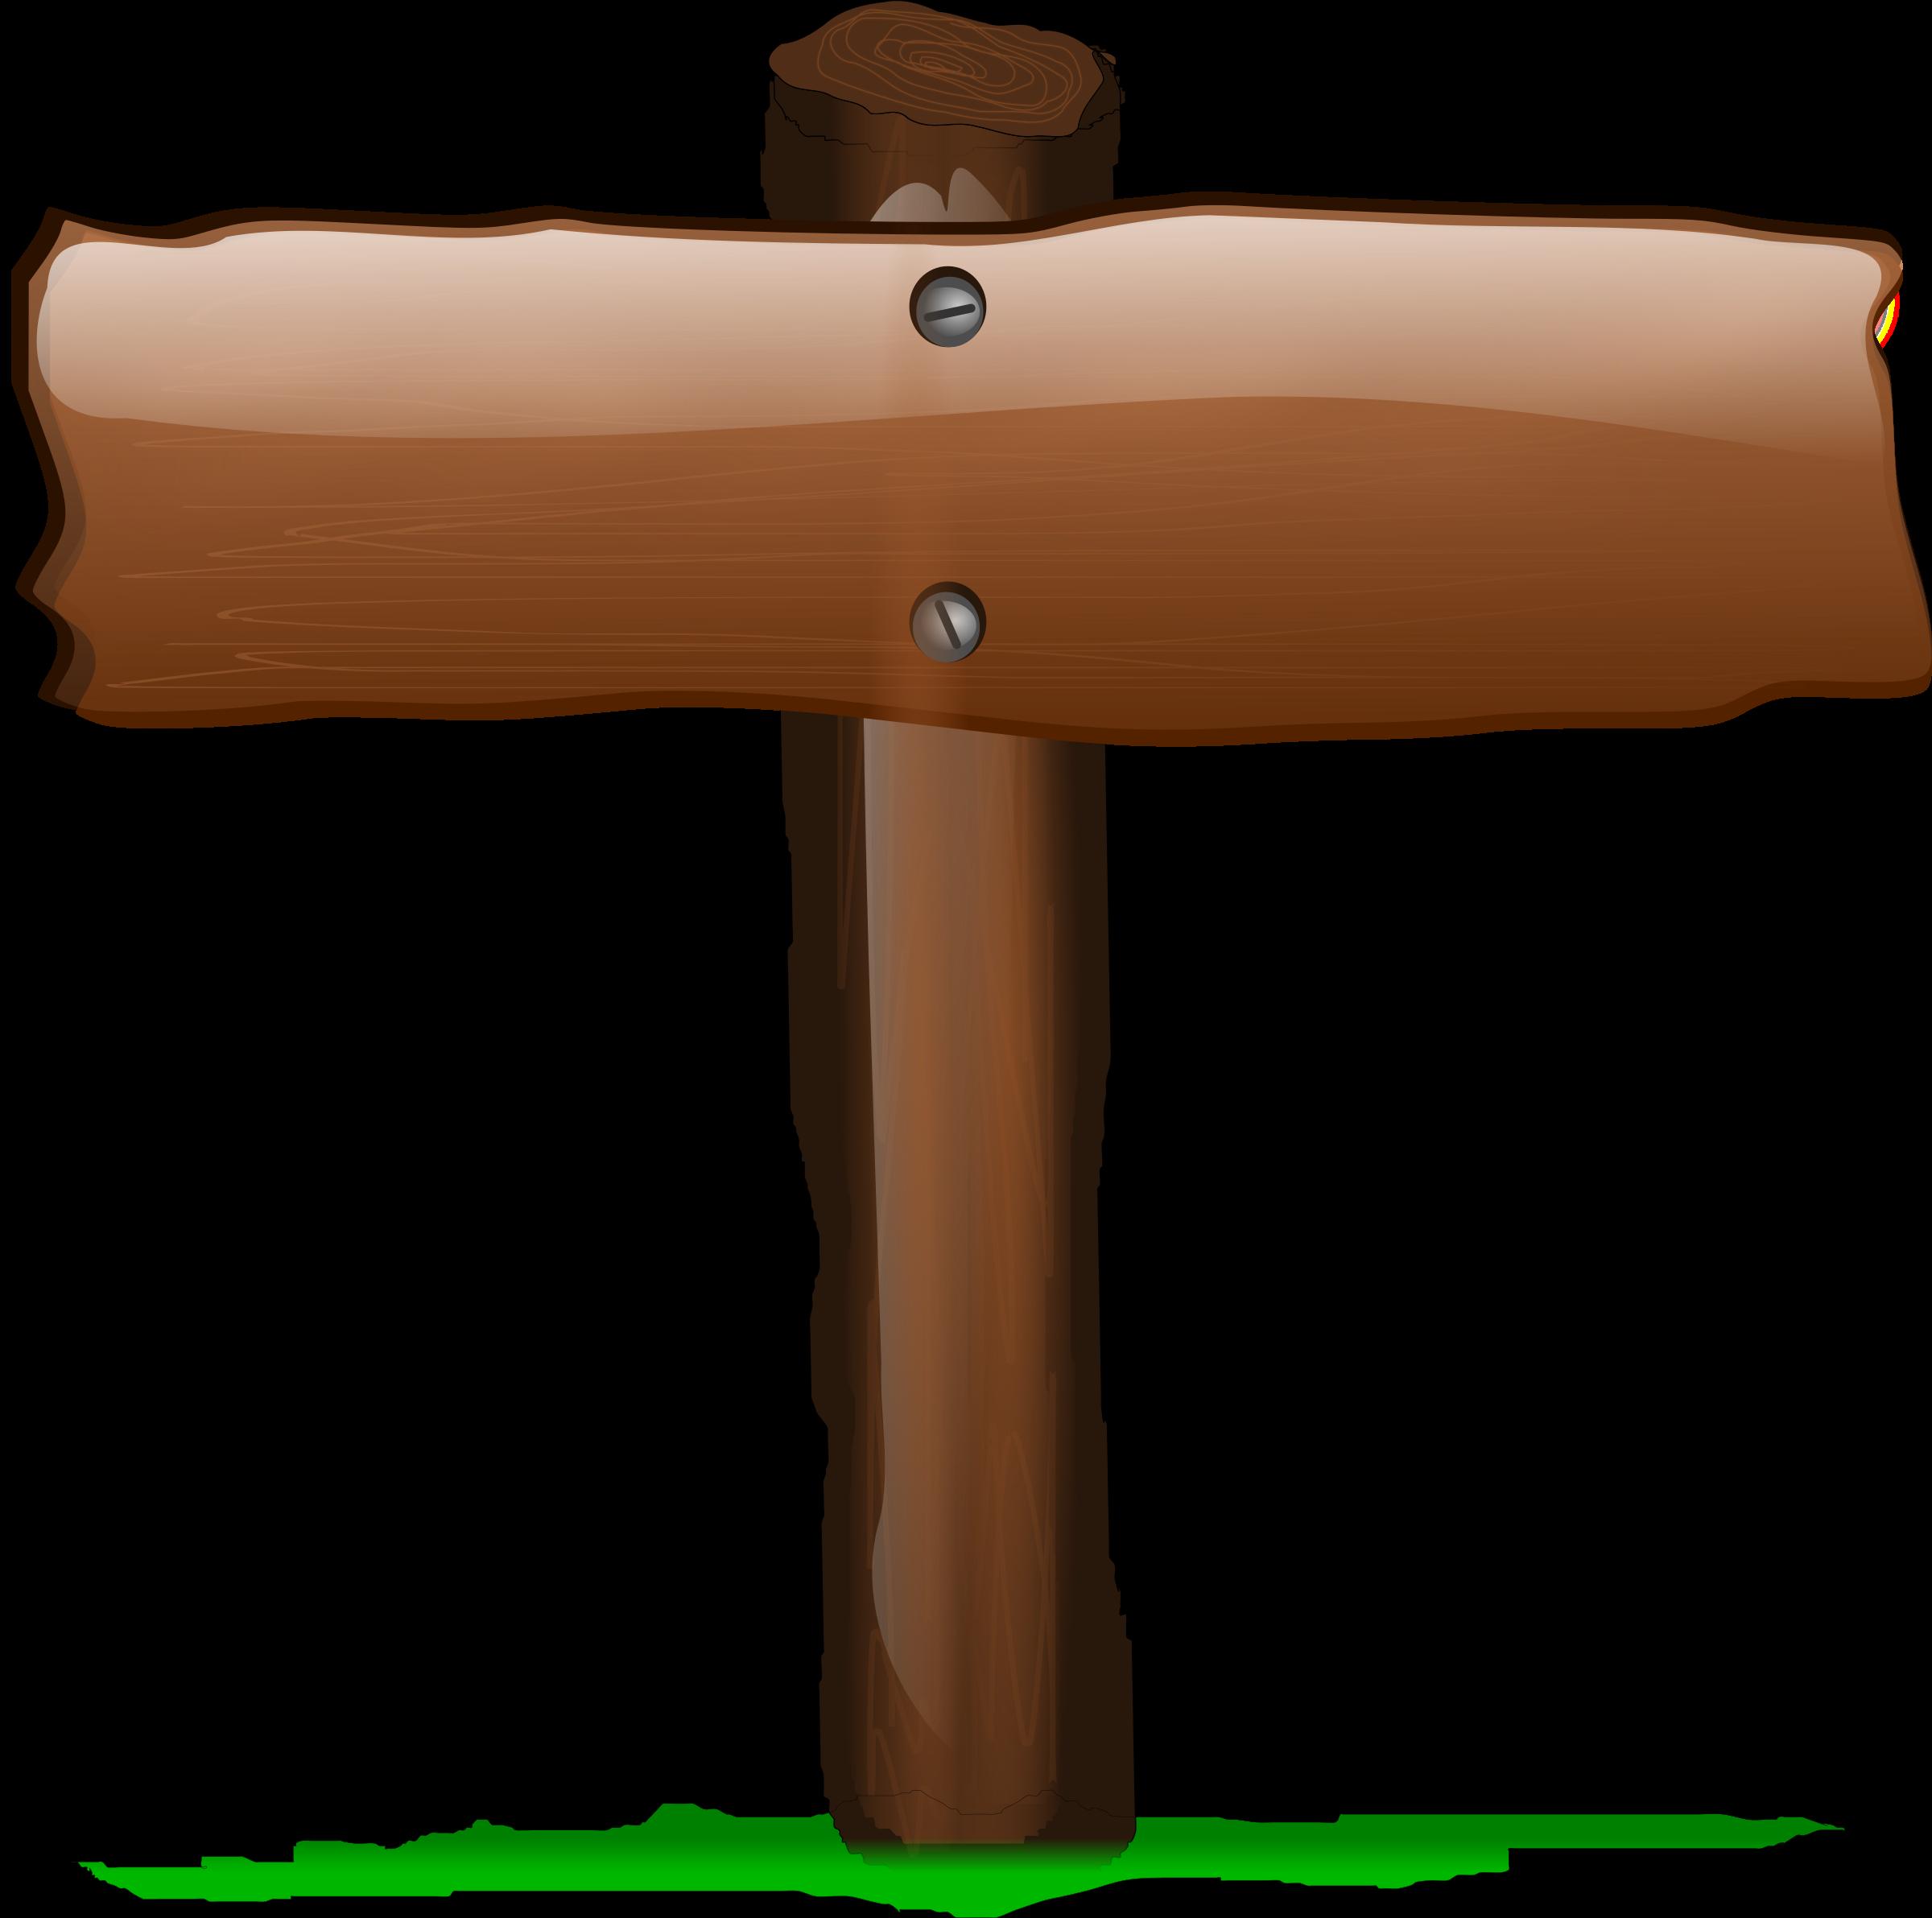 Sign big image png. Design clipart wood